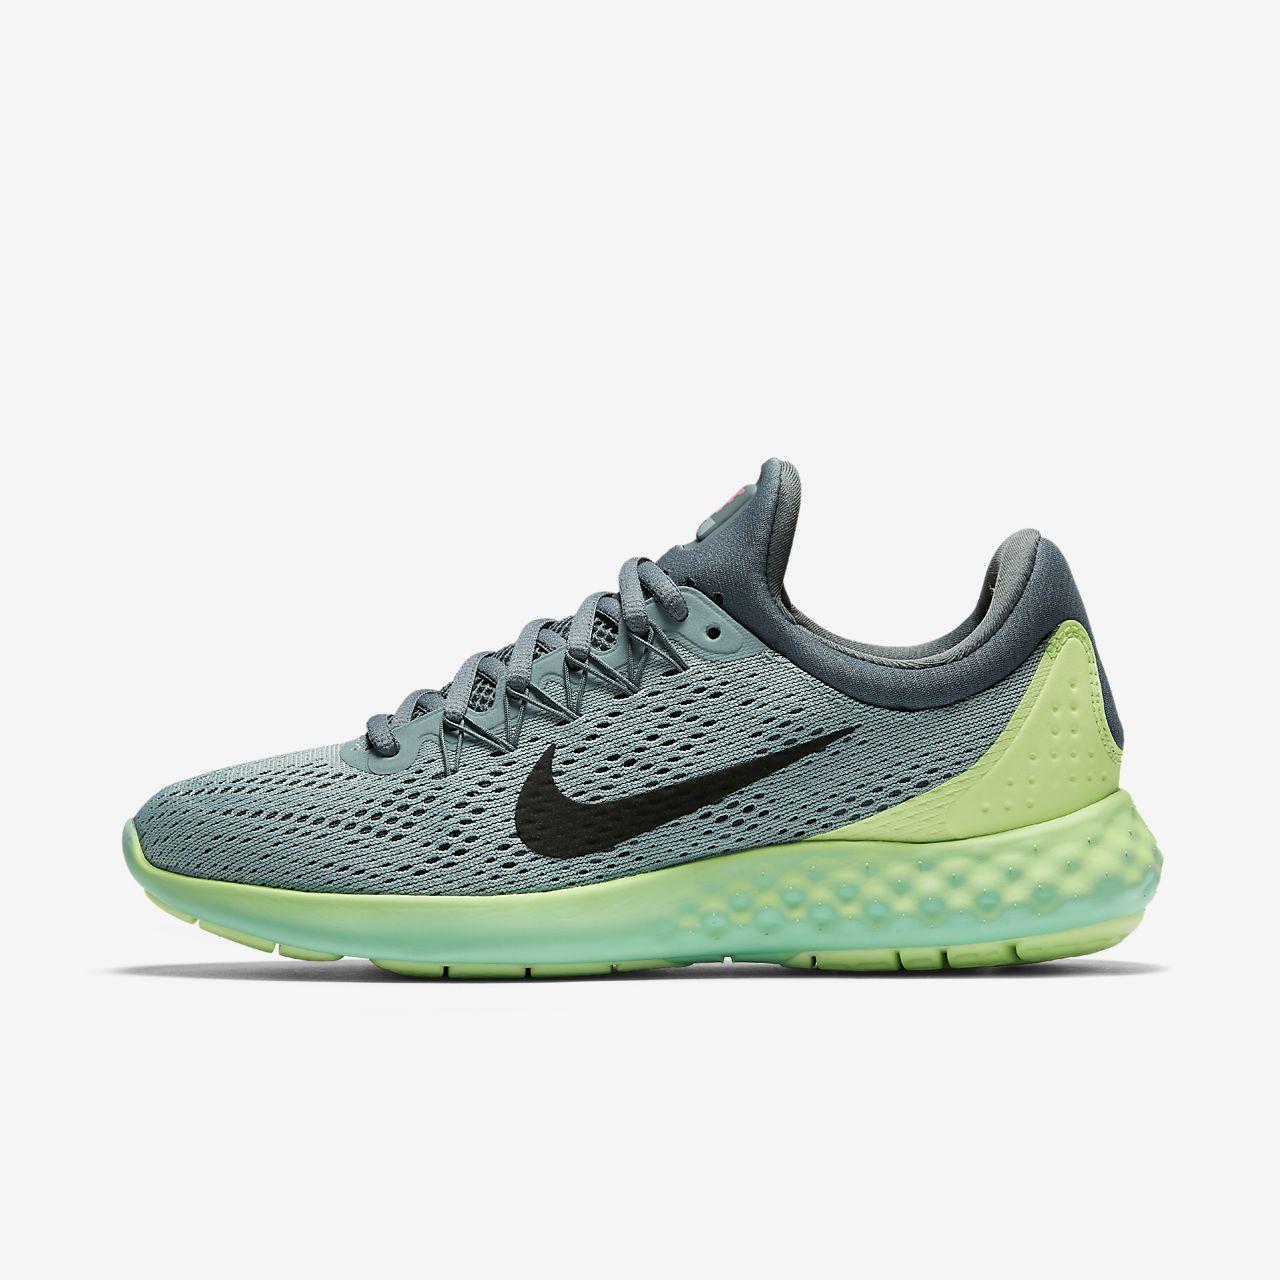 sneakers for cheap 494a4 16ebf ZAPATILLA NIKE LUNAR SOLO RUNNING